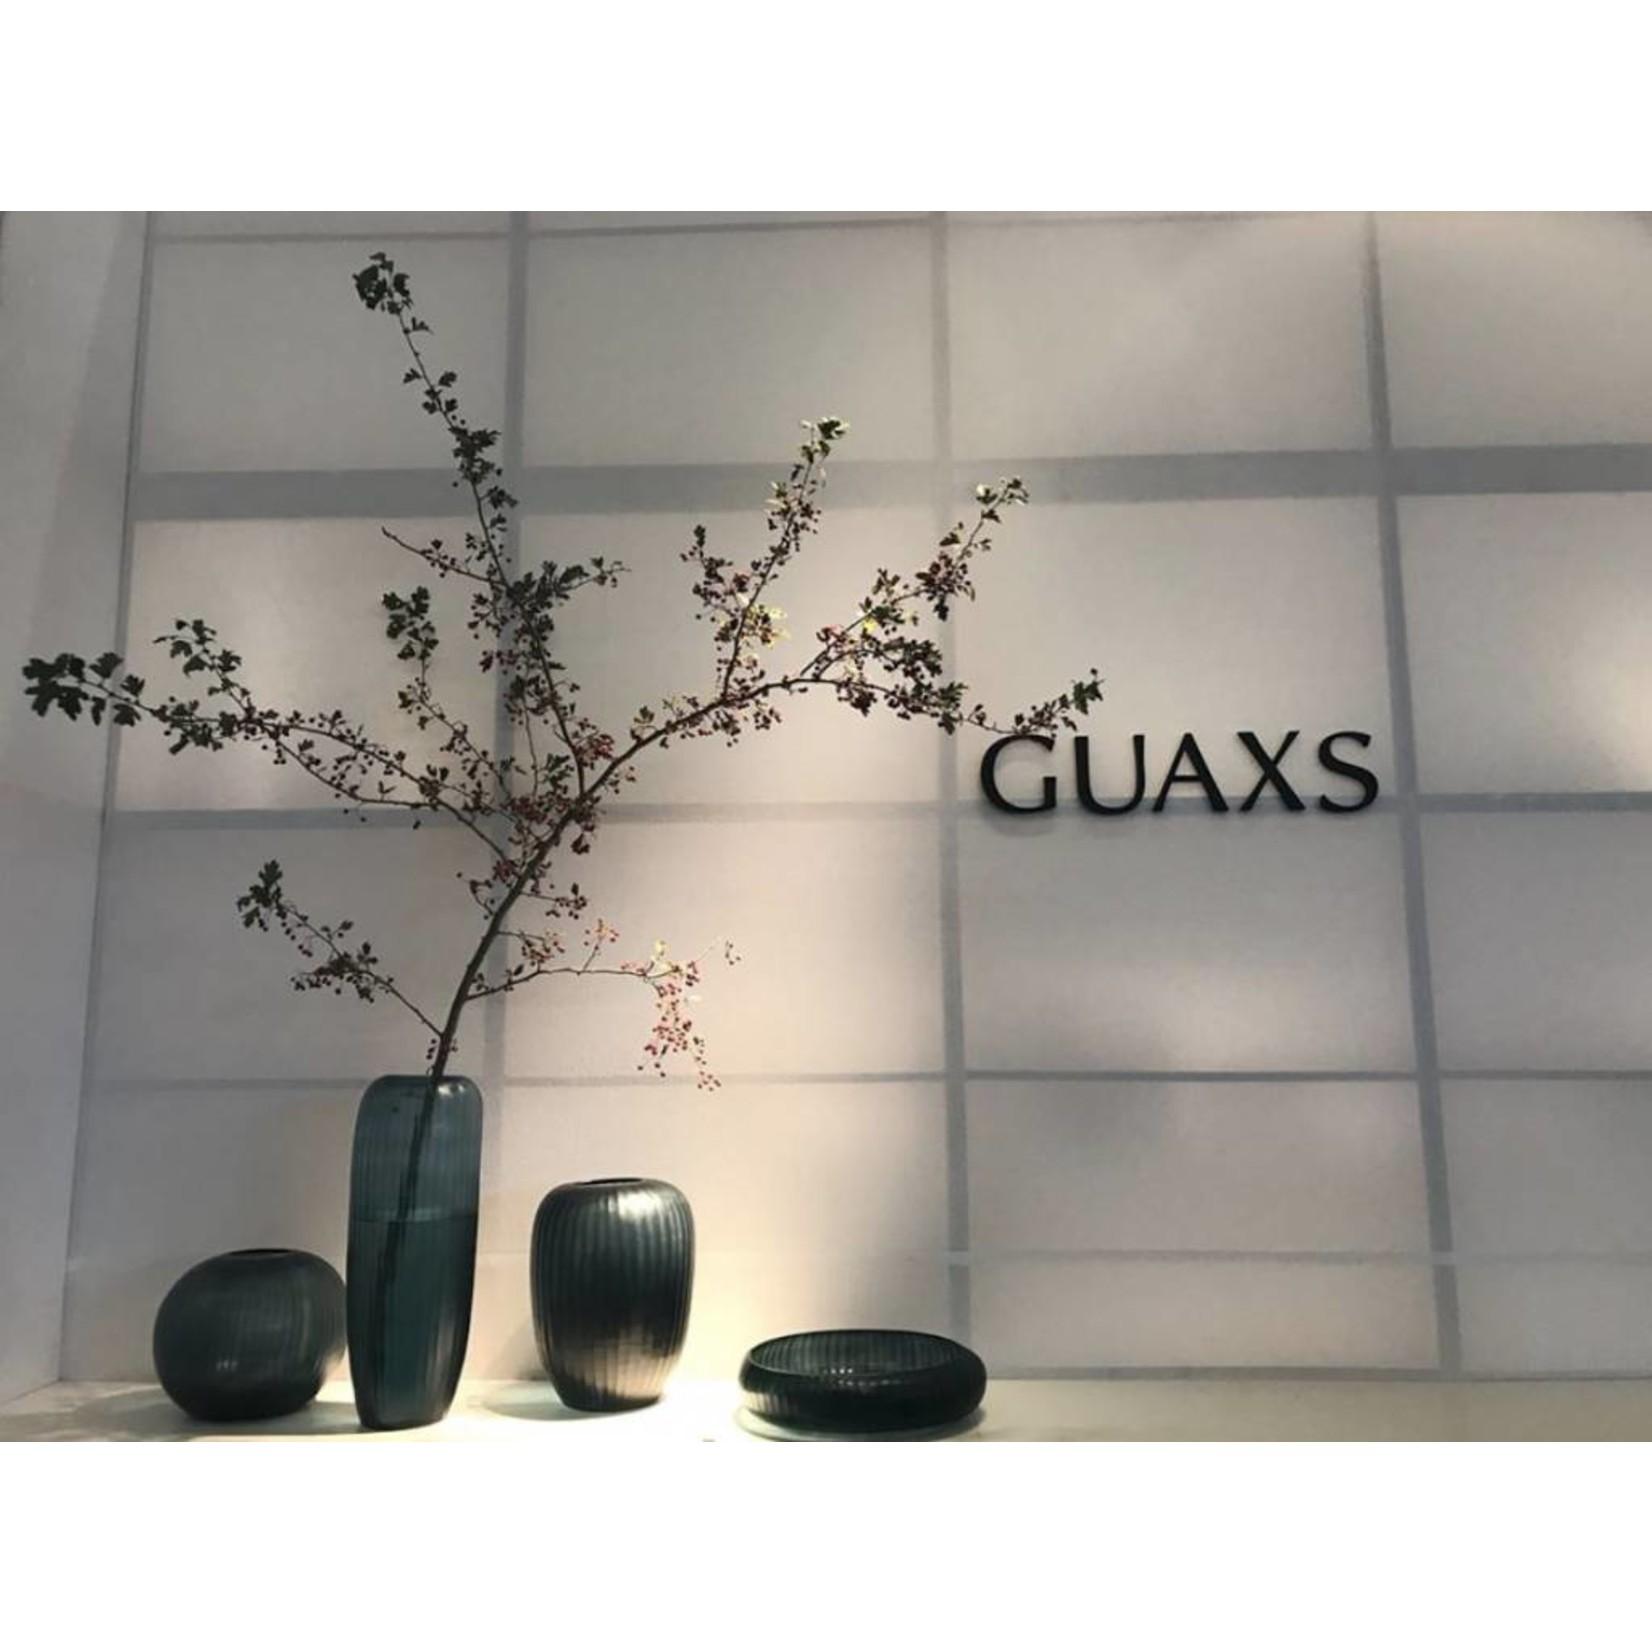 Guaxs Vase Gobi Round   Bleu océan / Indigo